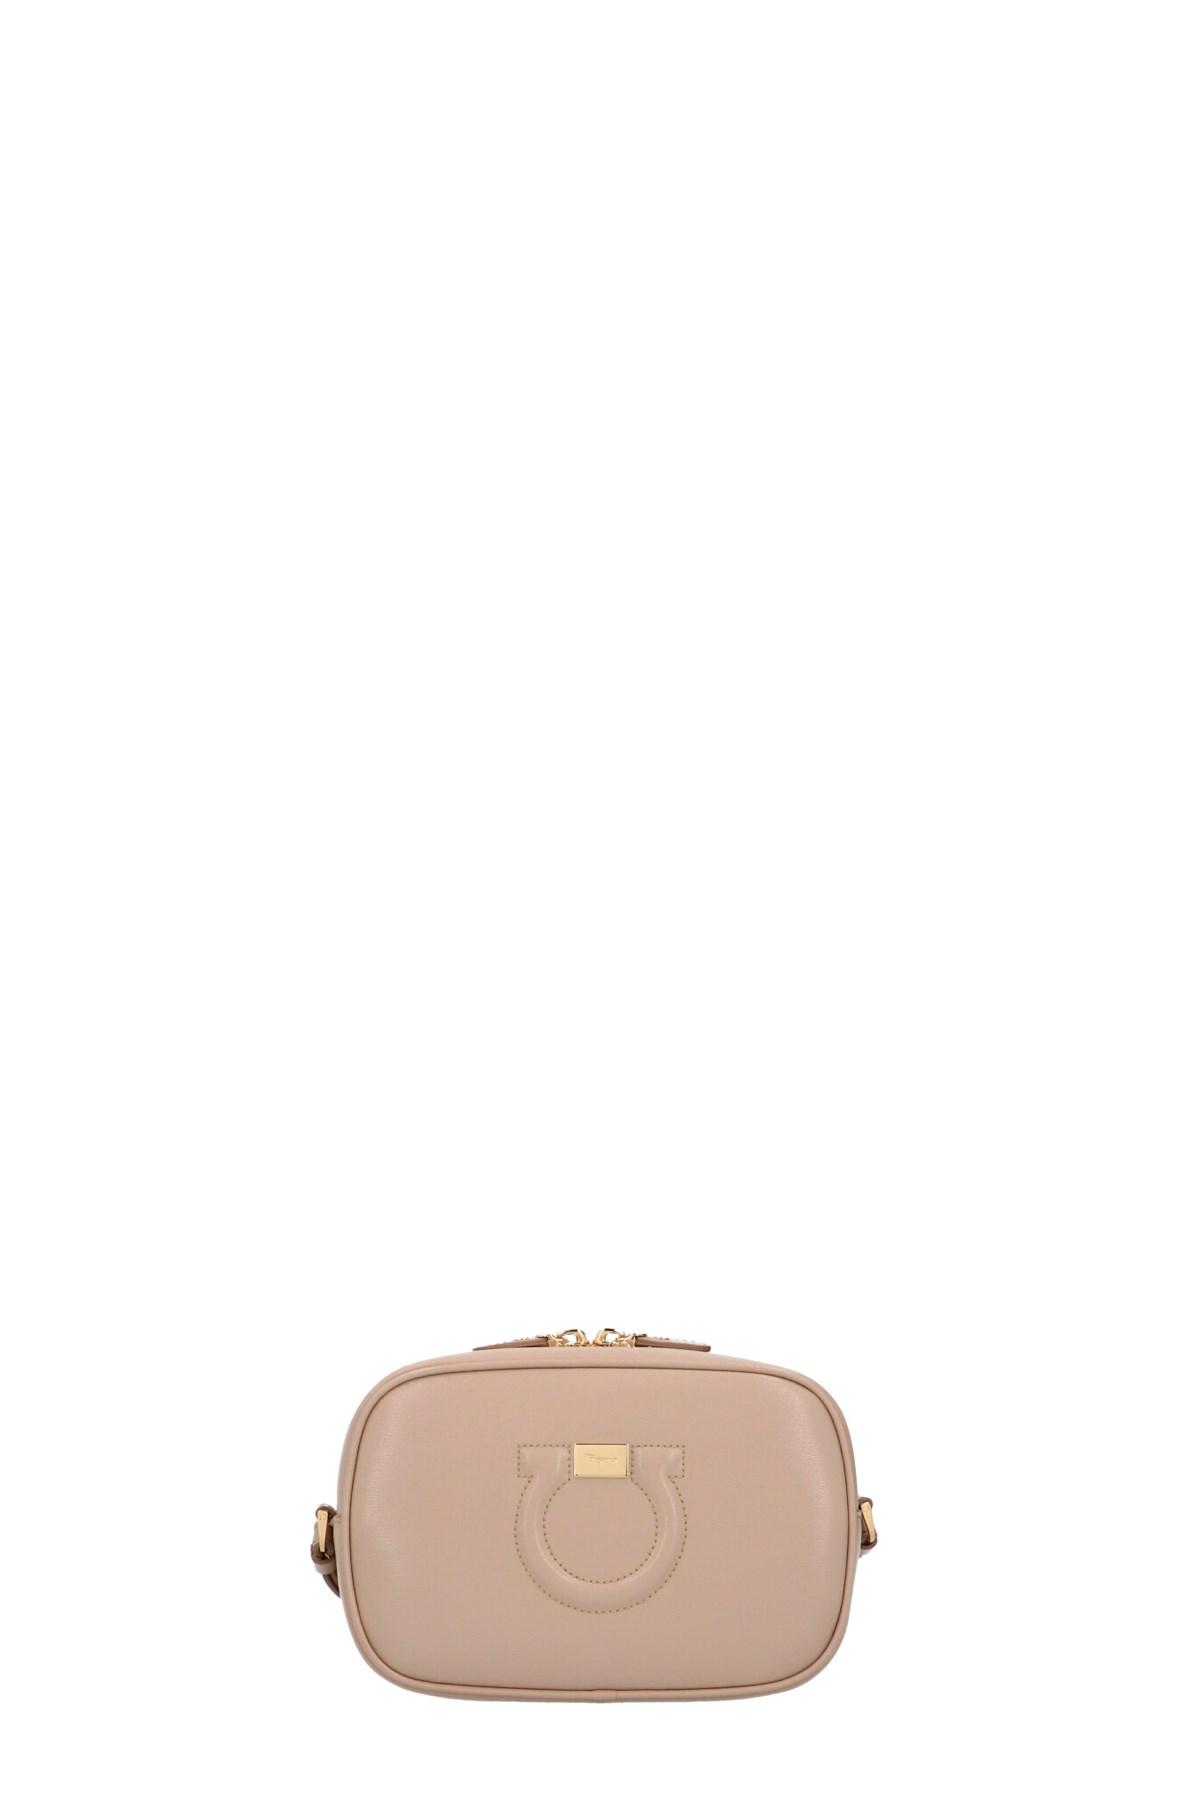 on wholesale cheaper online retailer 'Gancio City' crossbody bag